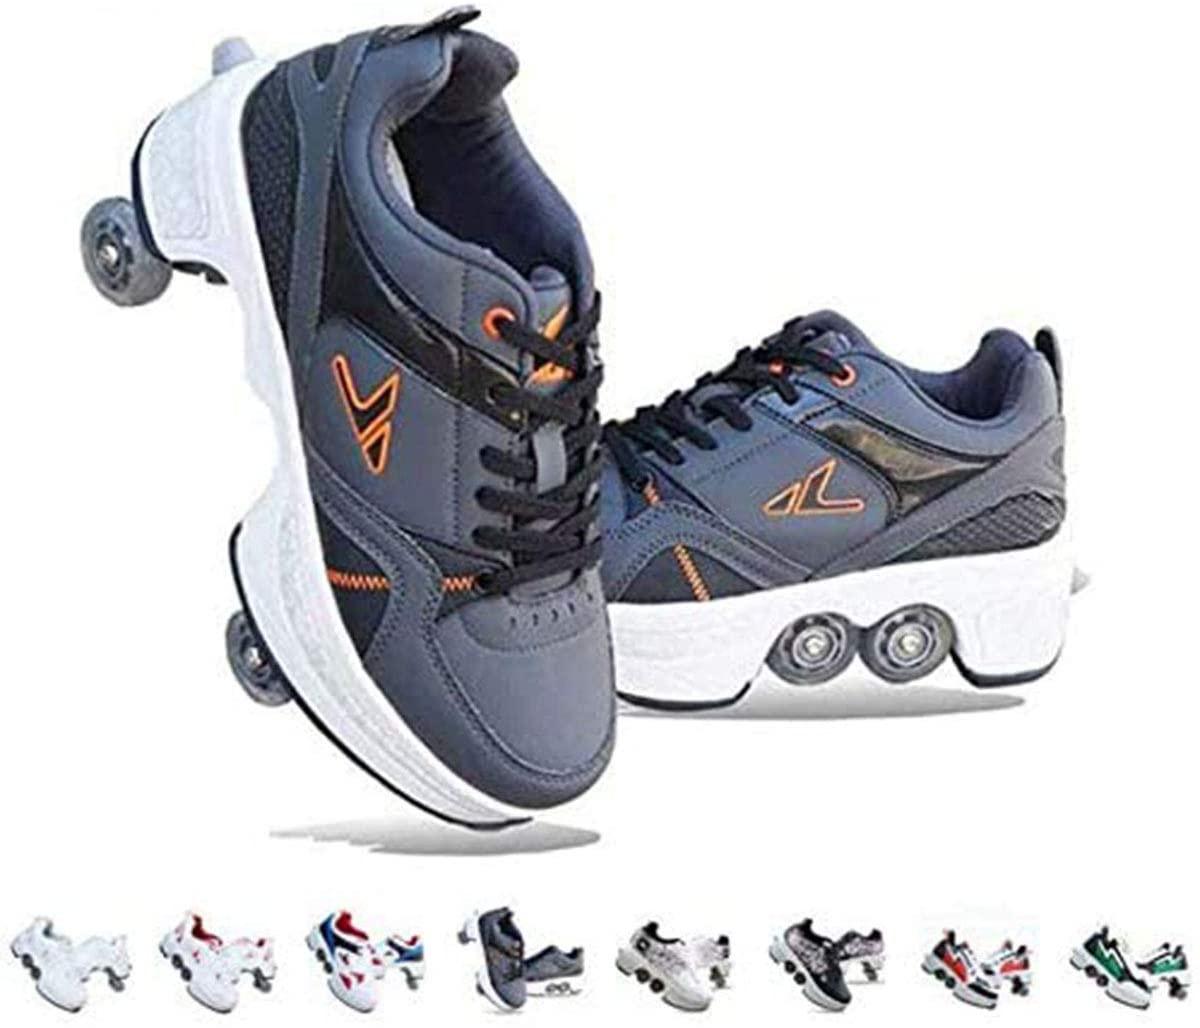 Deformation Shoes Adult Heely Walking Shoes Children's Students Roller Skates Blasting Shoes Skateboard Shoes Skating Size 31-43